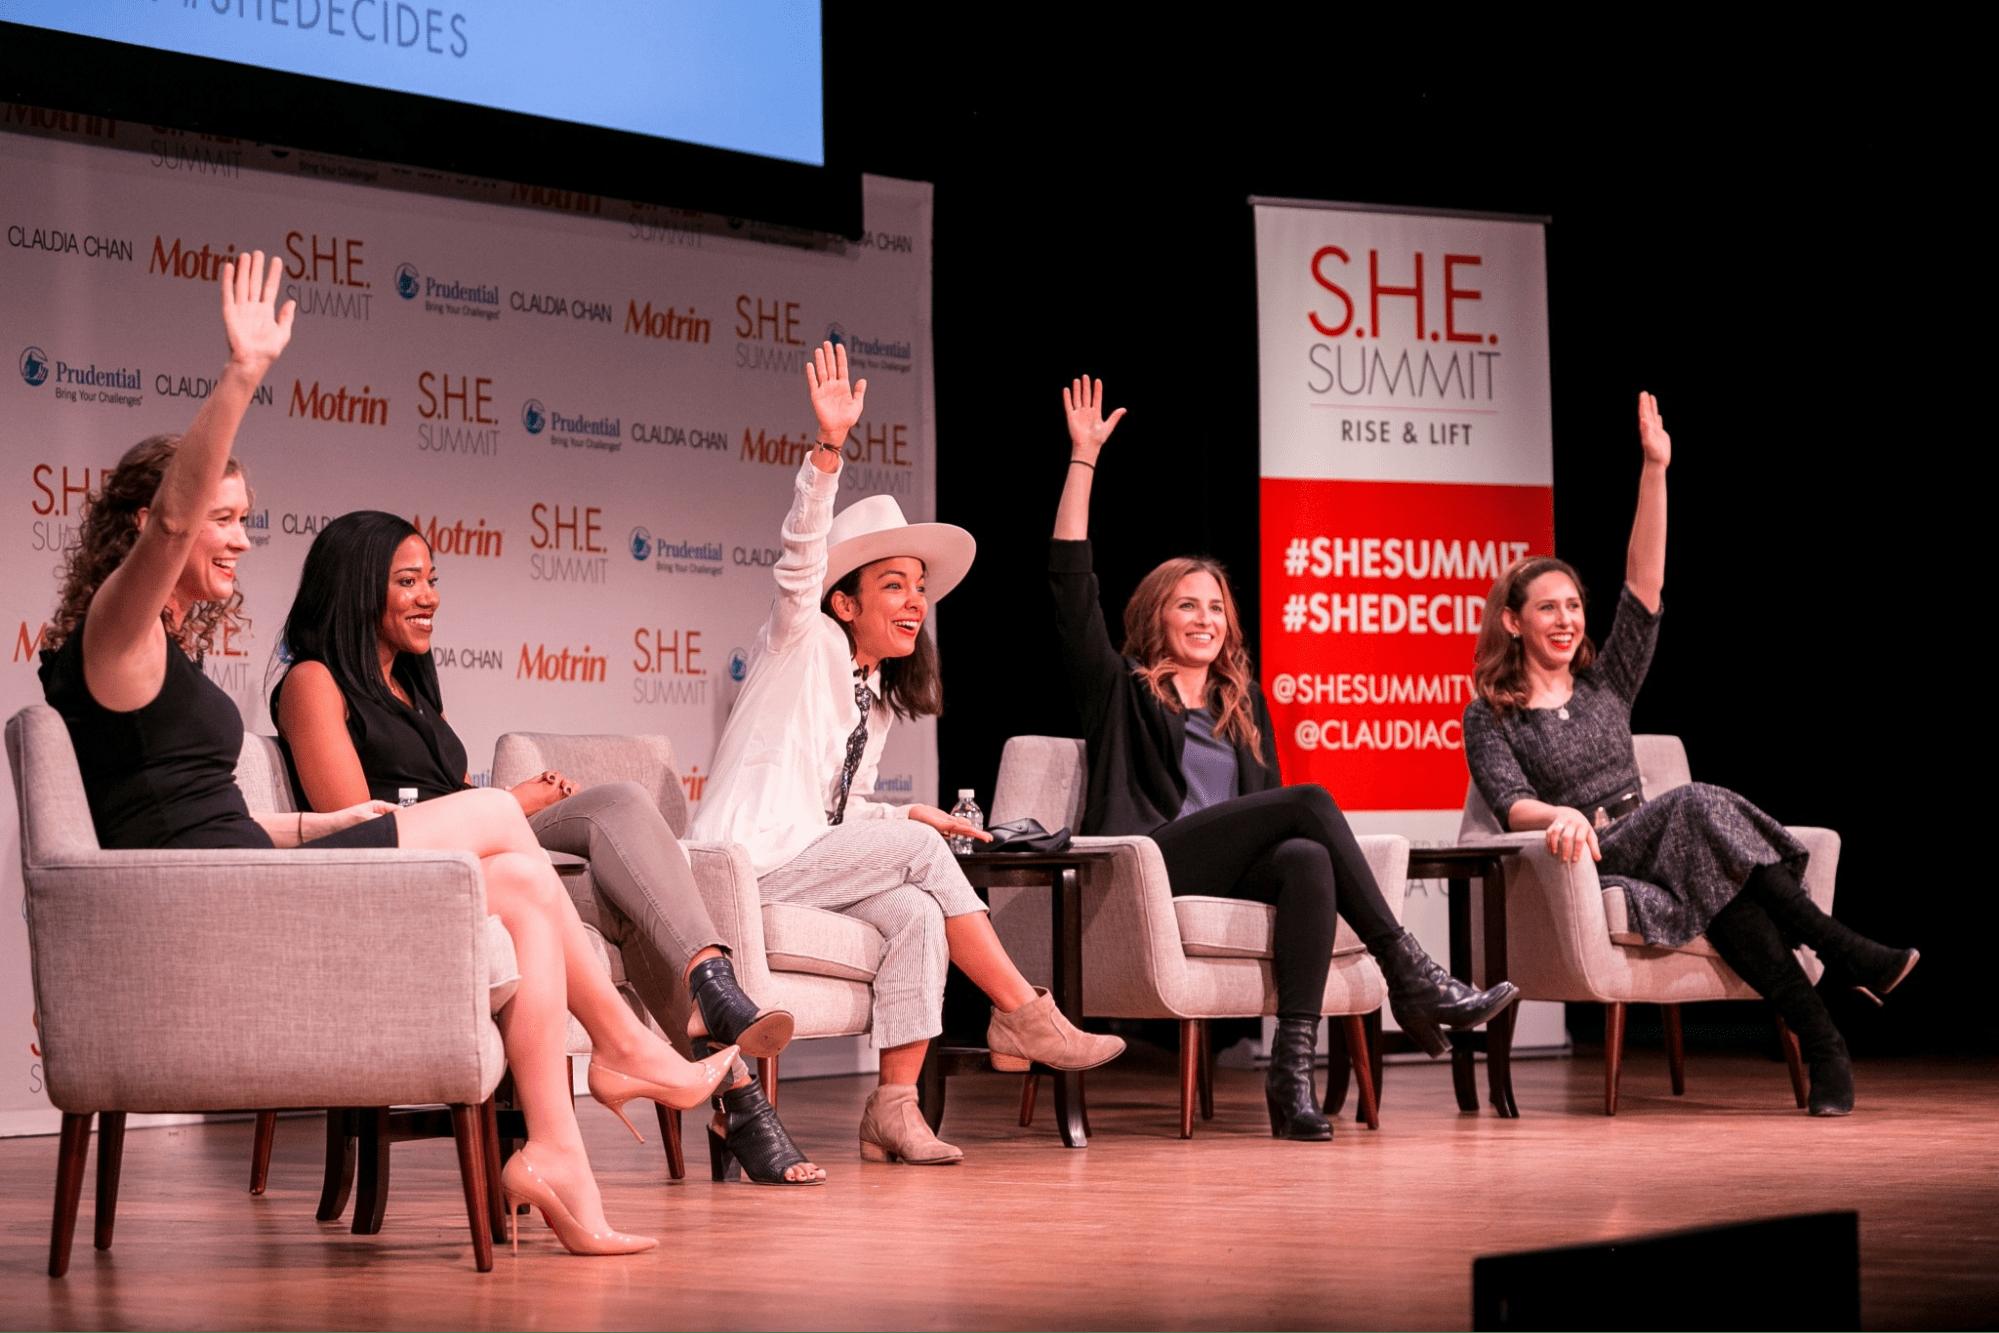 S.H.E. Summit - Women's Conference